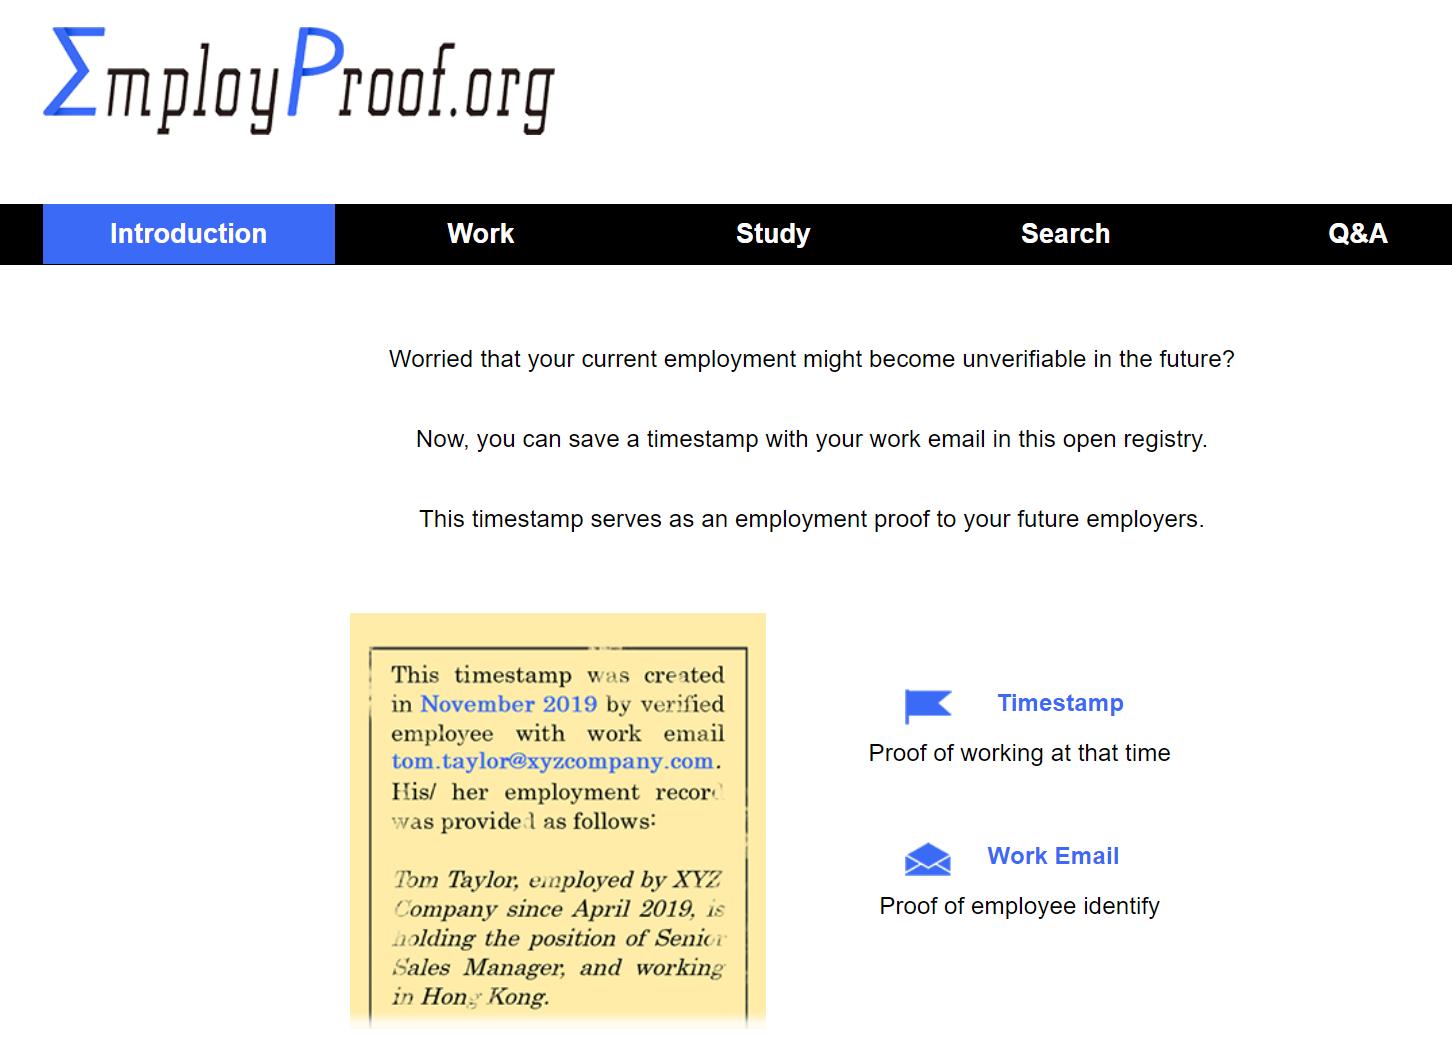 EmployProof.org